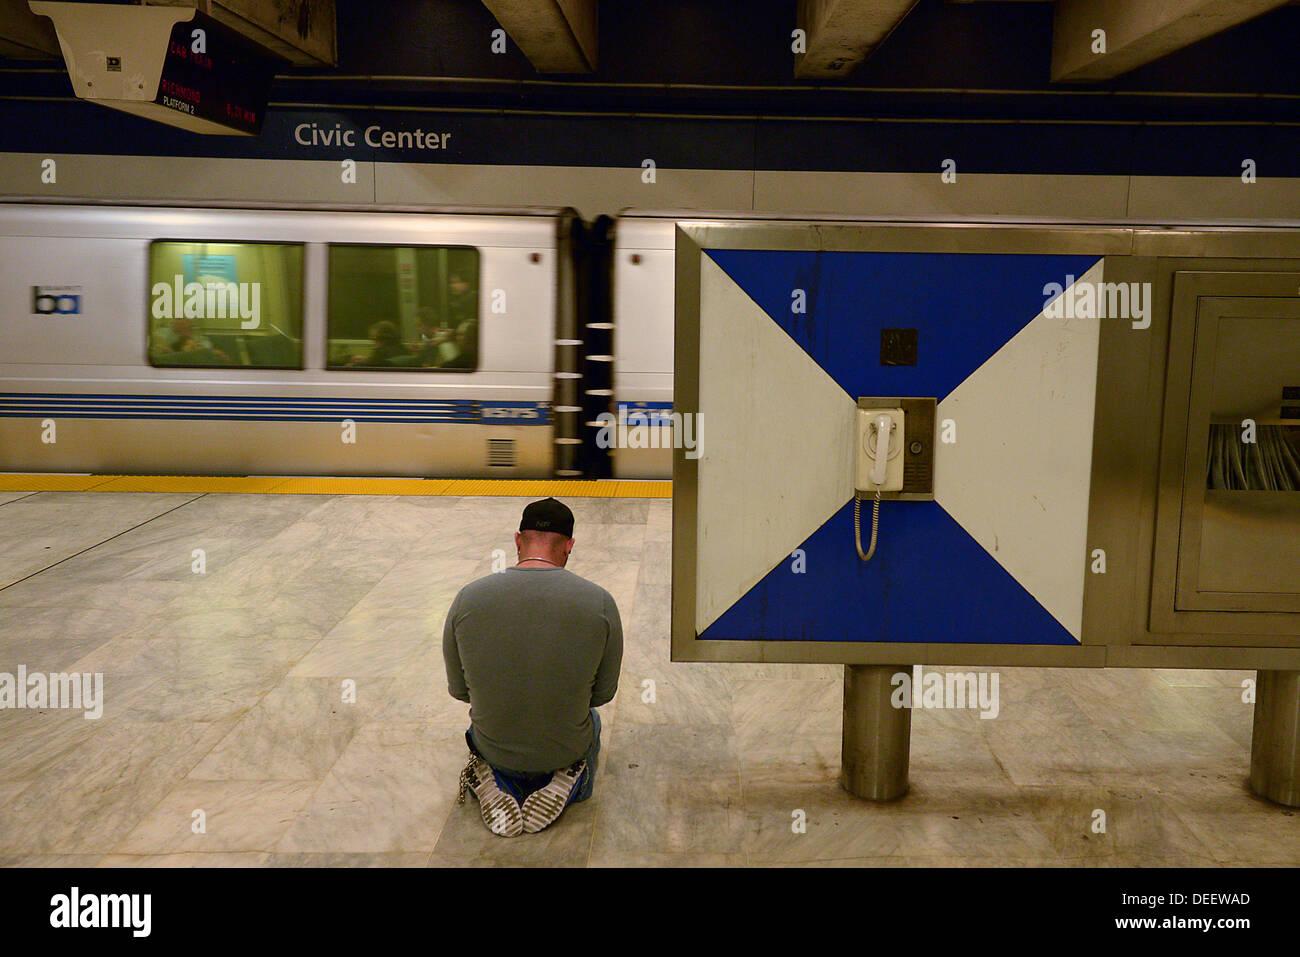 civic center bart station san francisco - Stock Image